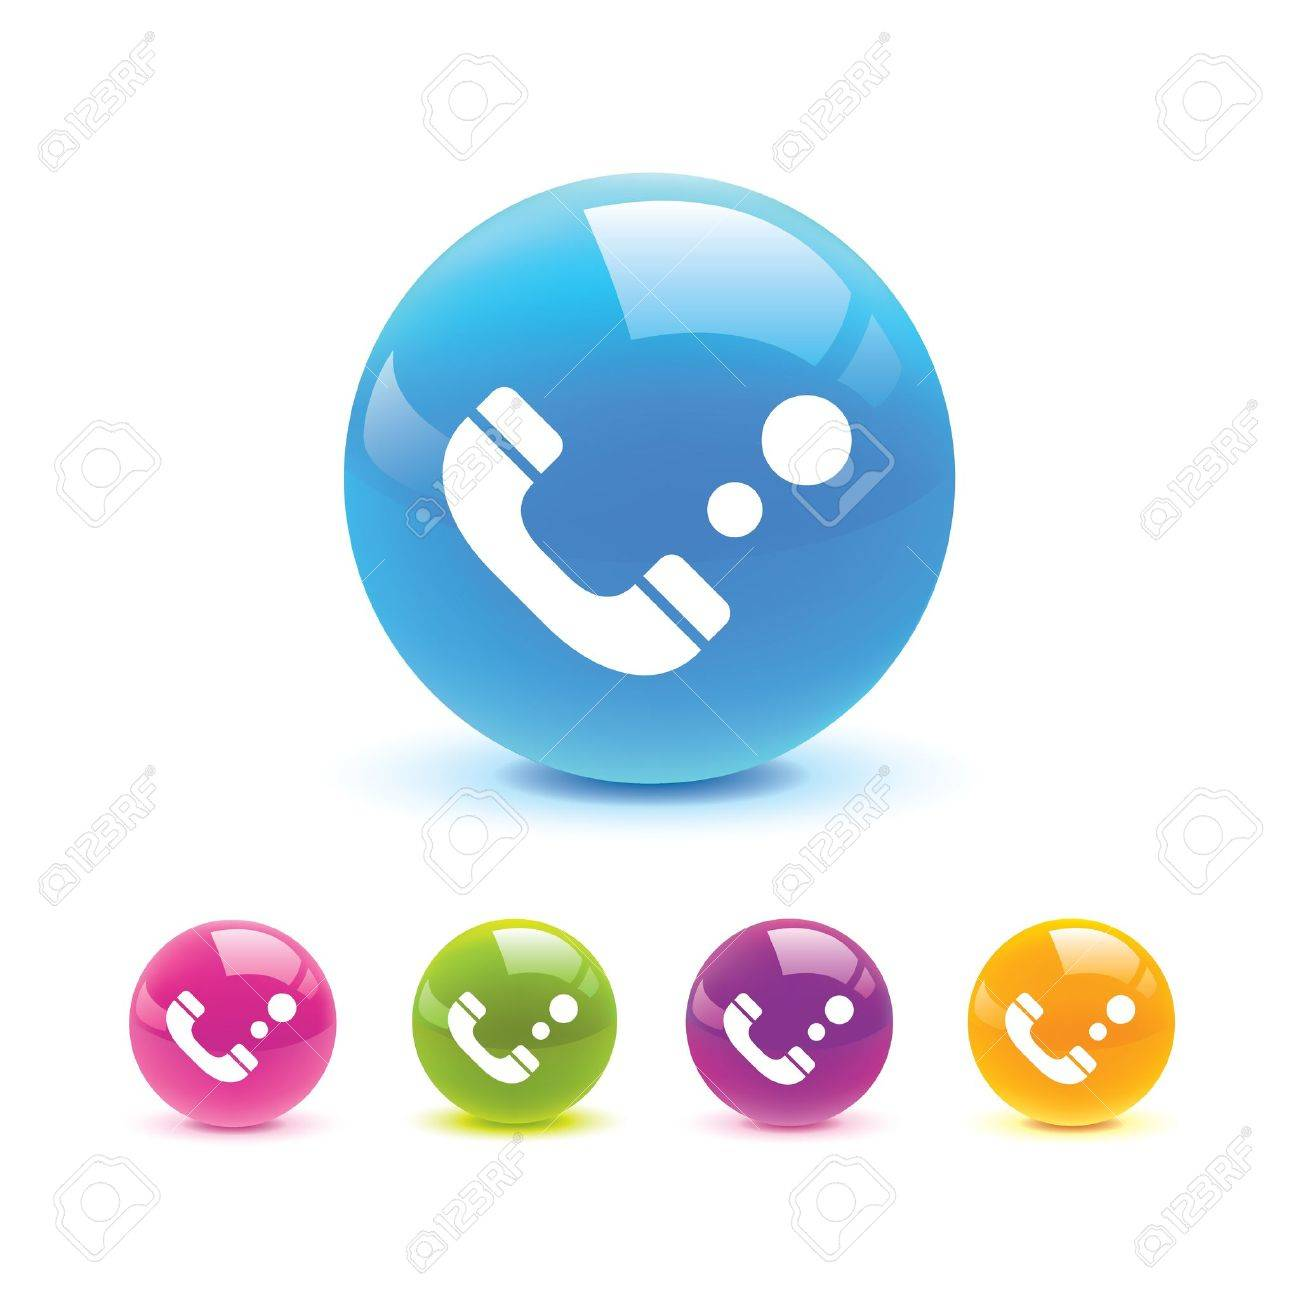 icon web set for use - 19734247